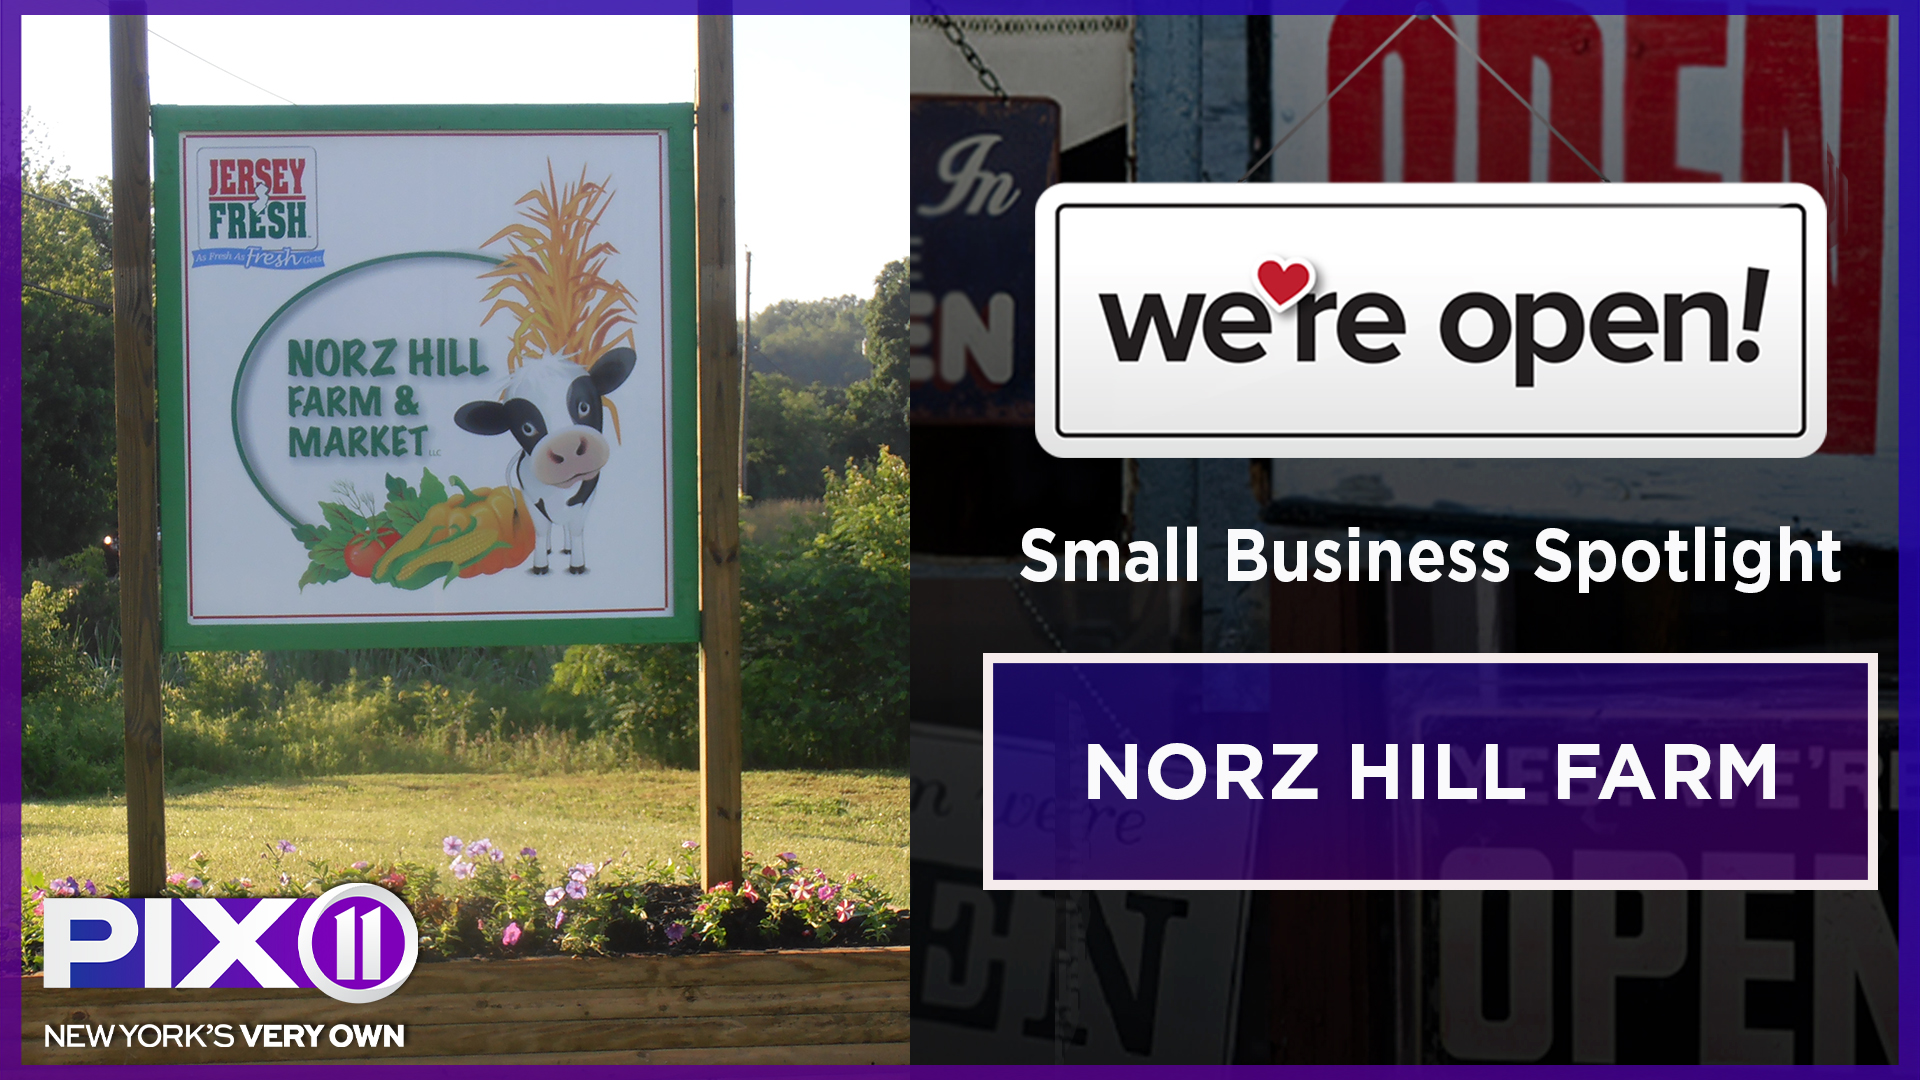 Norz Hill Farm